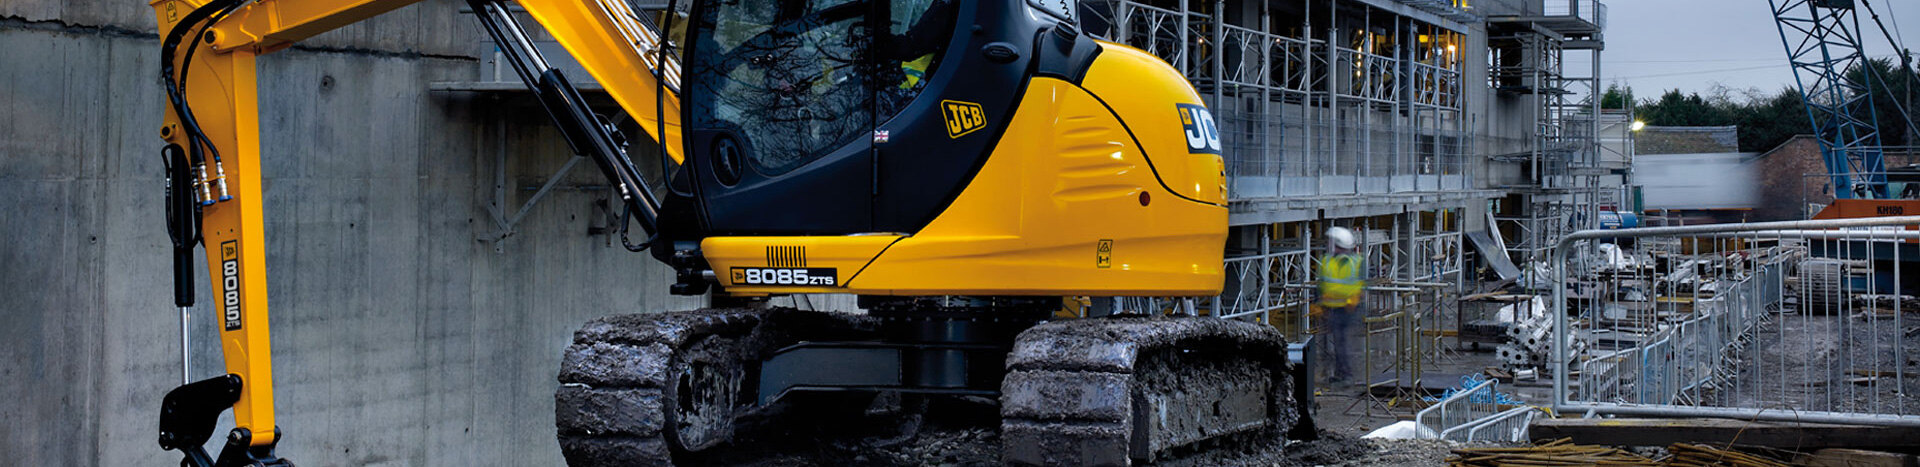 Advance Construction Equipment, selling new,used,JCB BackHoe,JCB